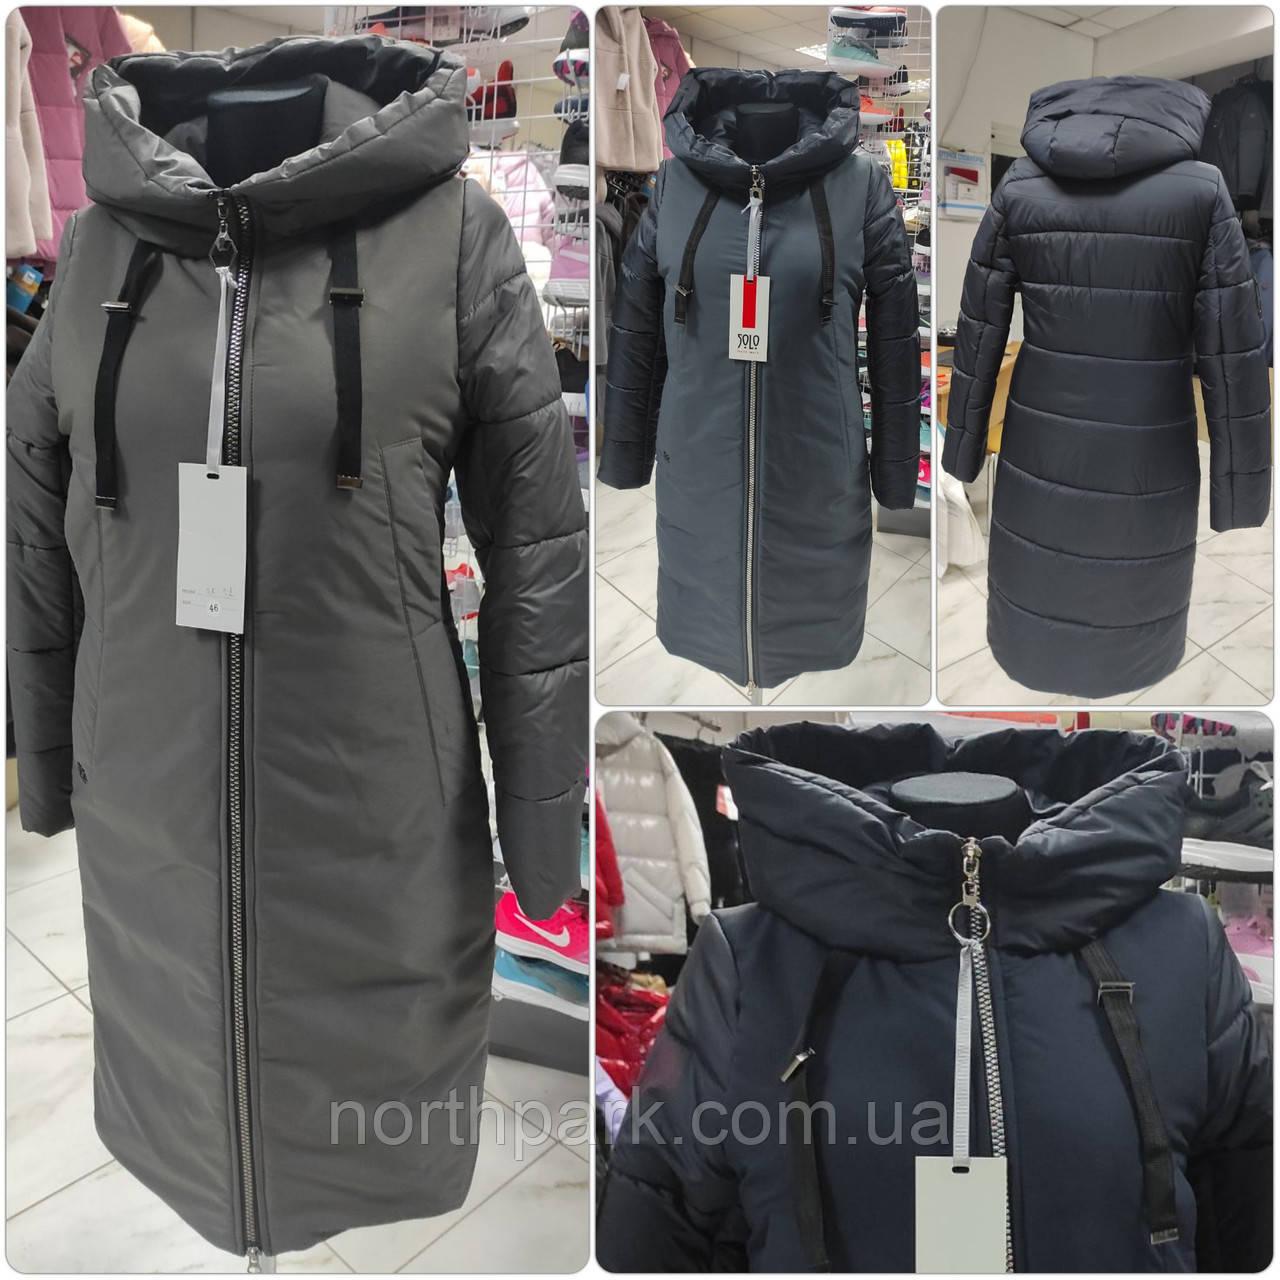 Стильна подовжена зимова куртка Solo SV-21